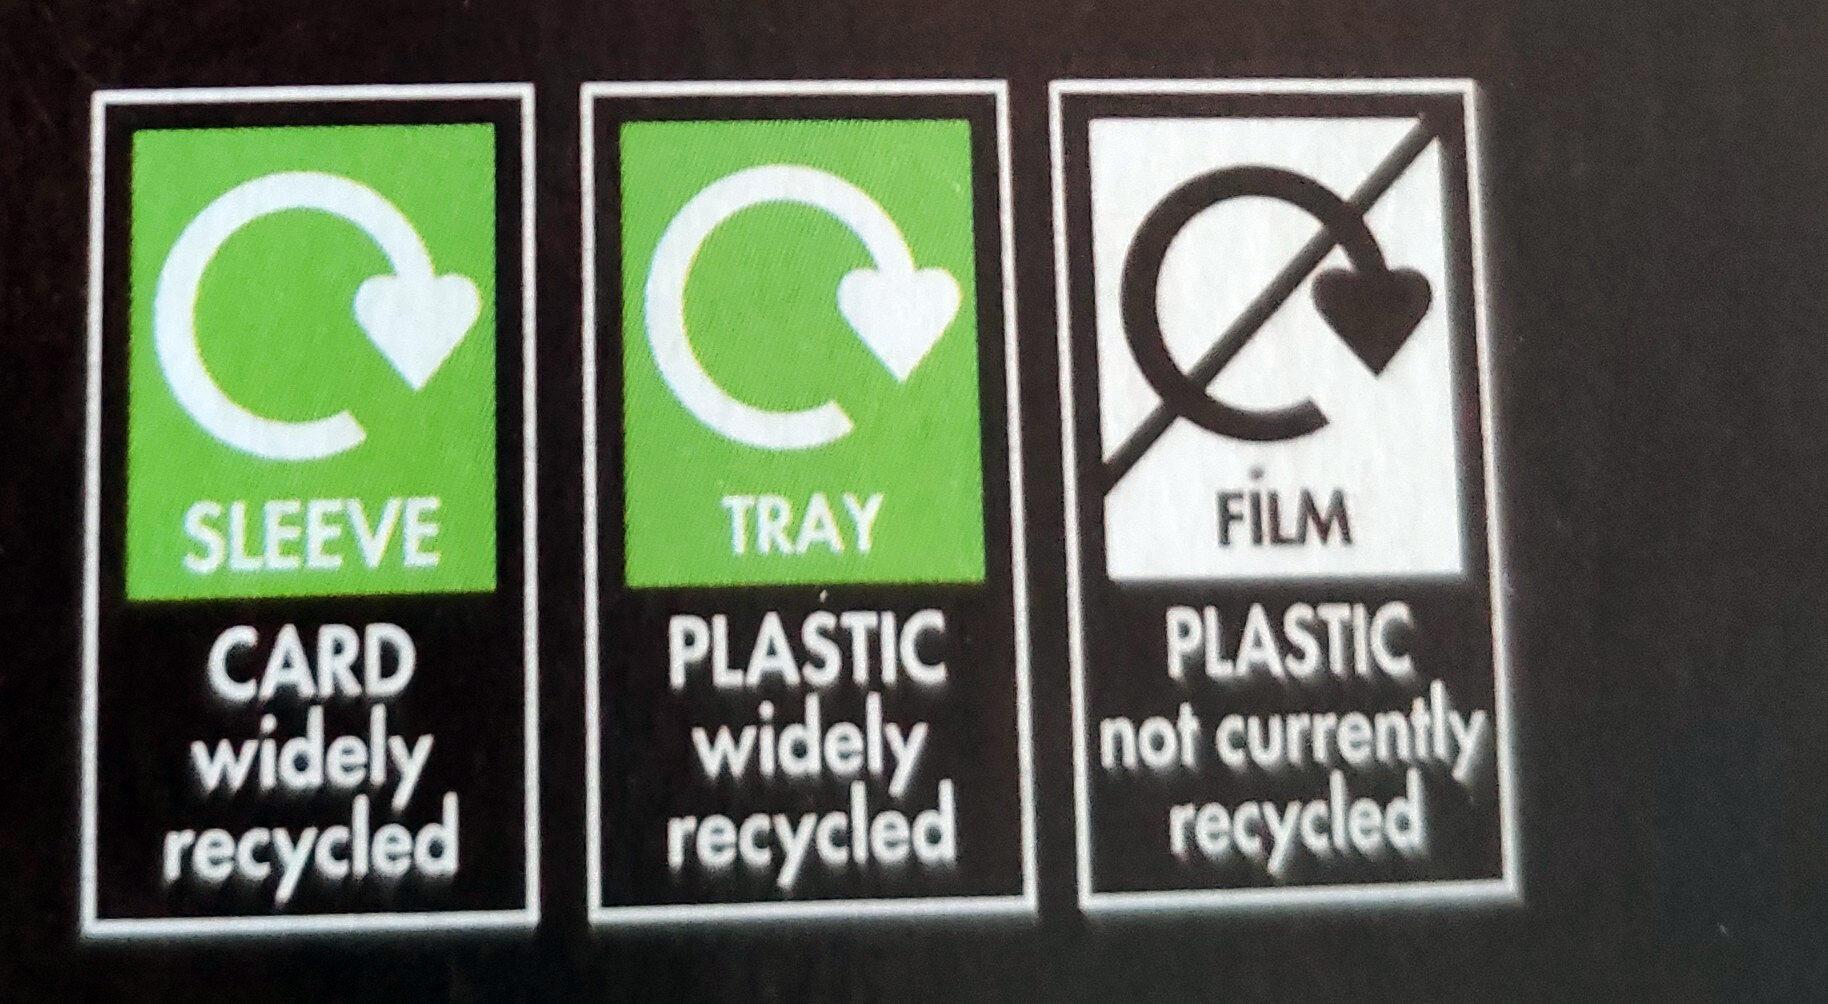 Organic Marinated Tofu - Instruction de recyclage et/ou informations d'emballage - en